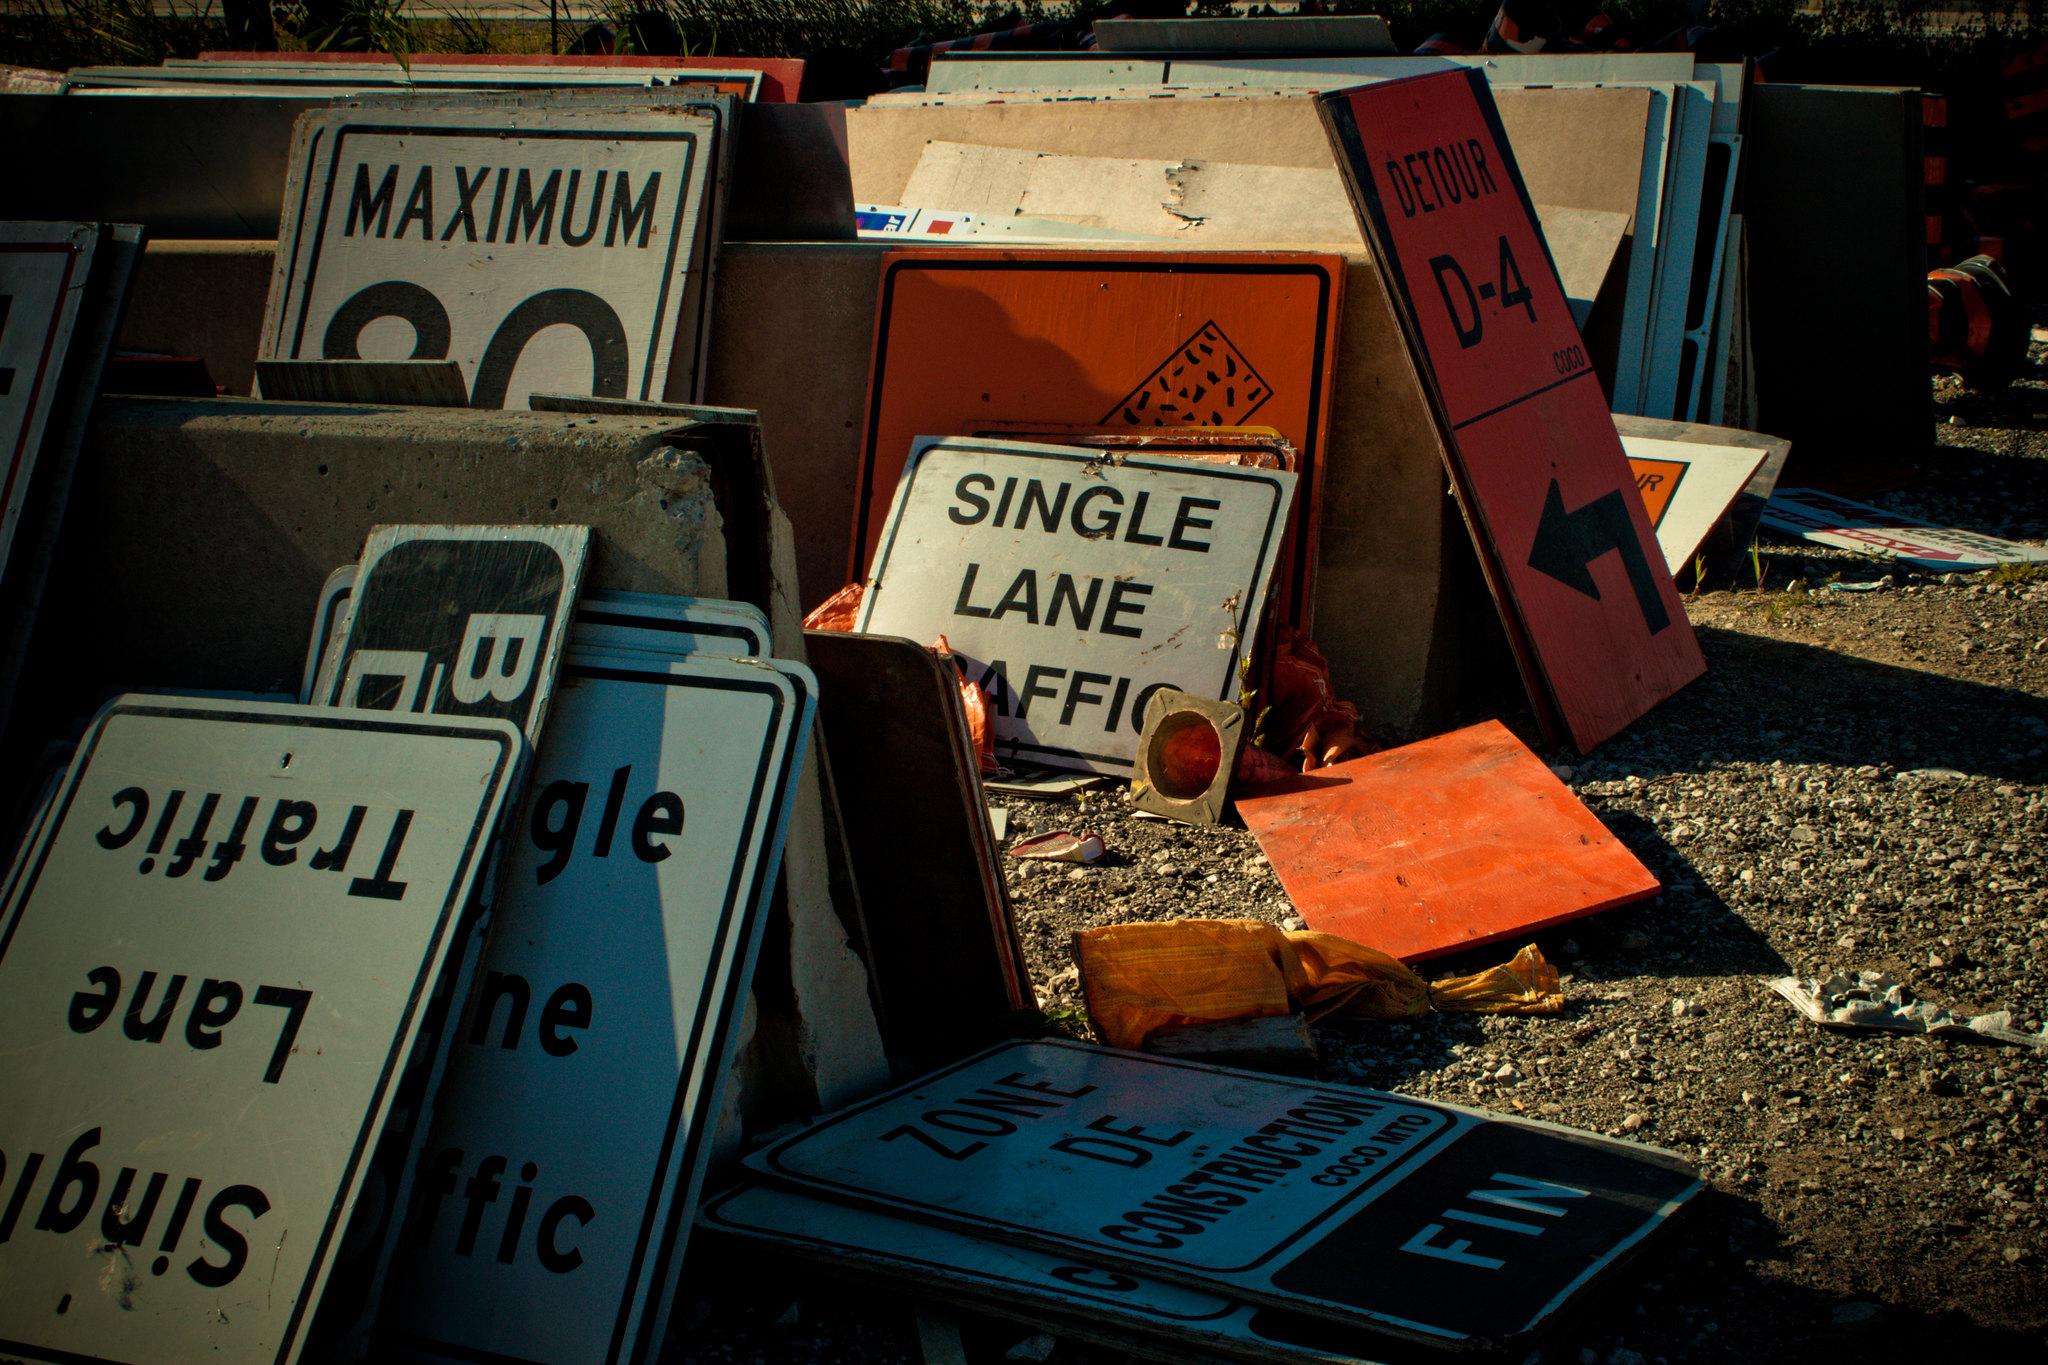 Single lane traffic. (Sharon Drummond / Flickr / CC BY-NC-SA 2.0)